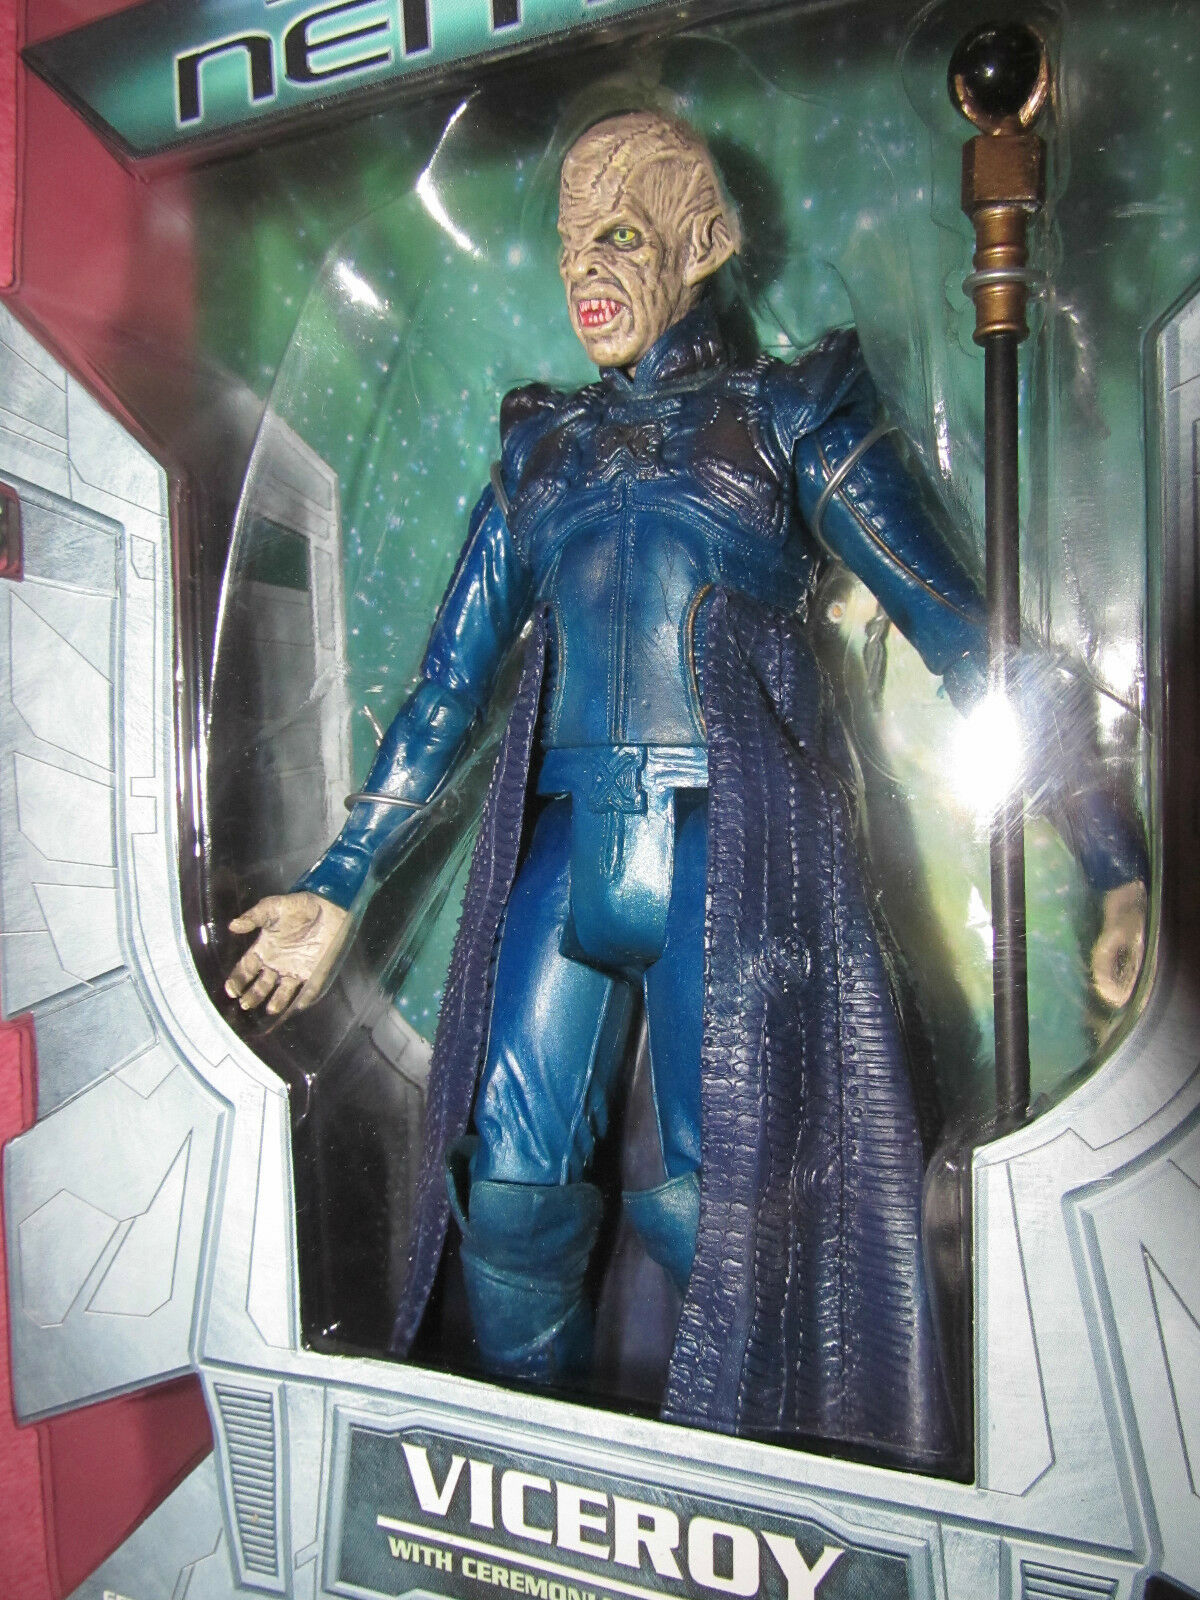 Star Trek Nemesis set of 4 -PICARD, DATA, VICEROY, VICEROY, VICEROY, SHINZON by Art Asylum  2002 94d113